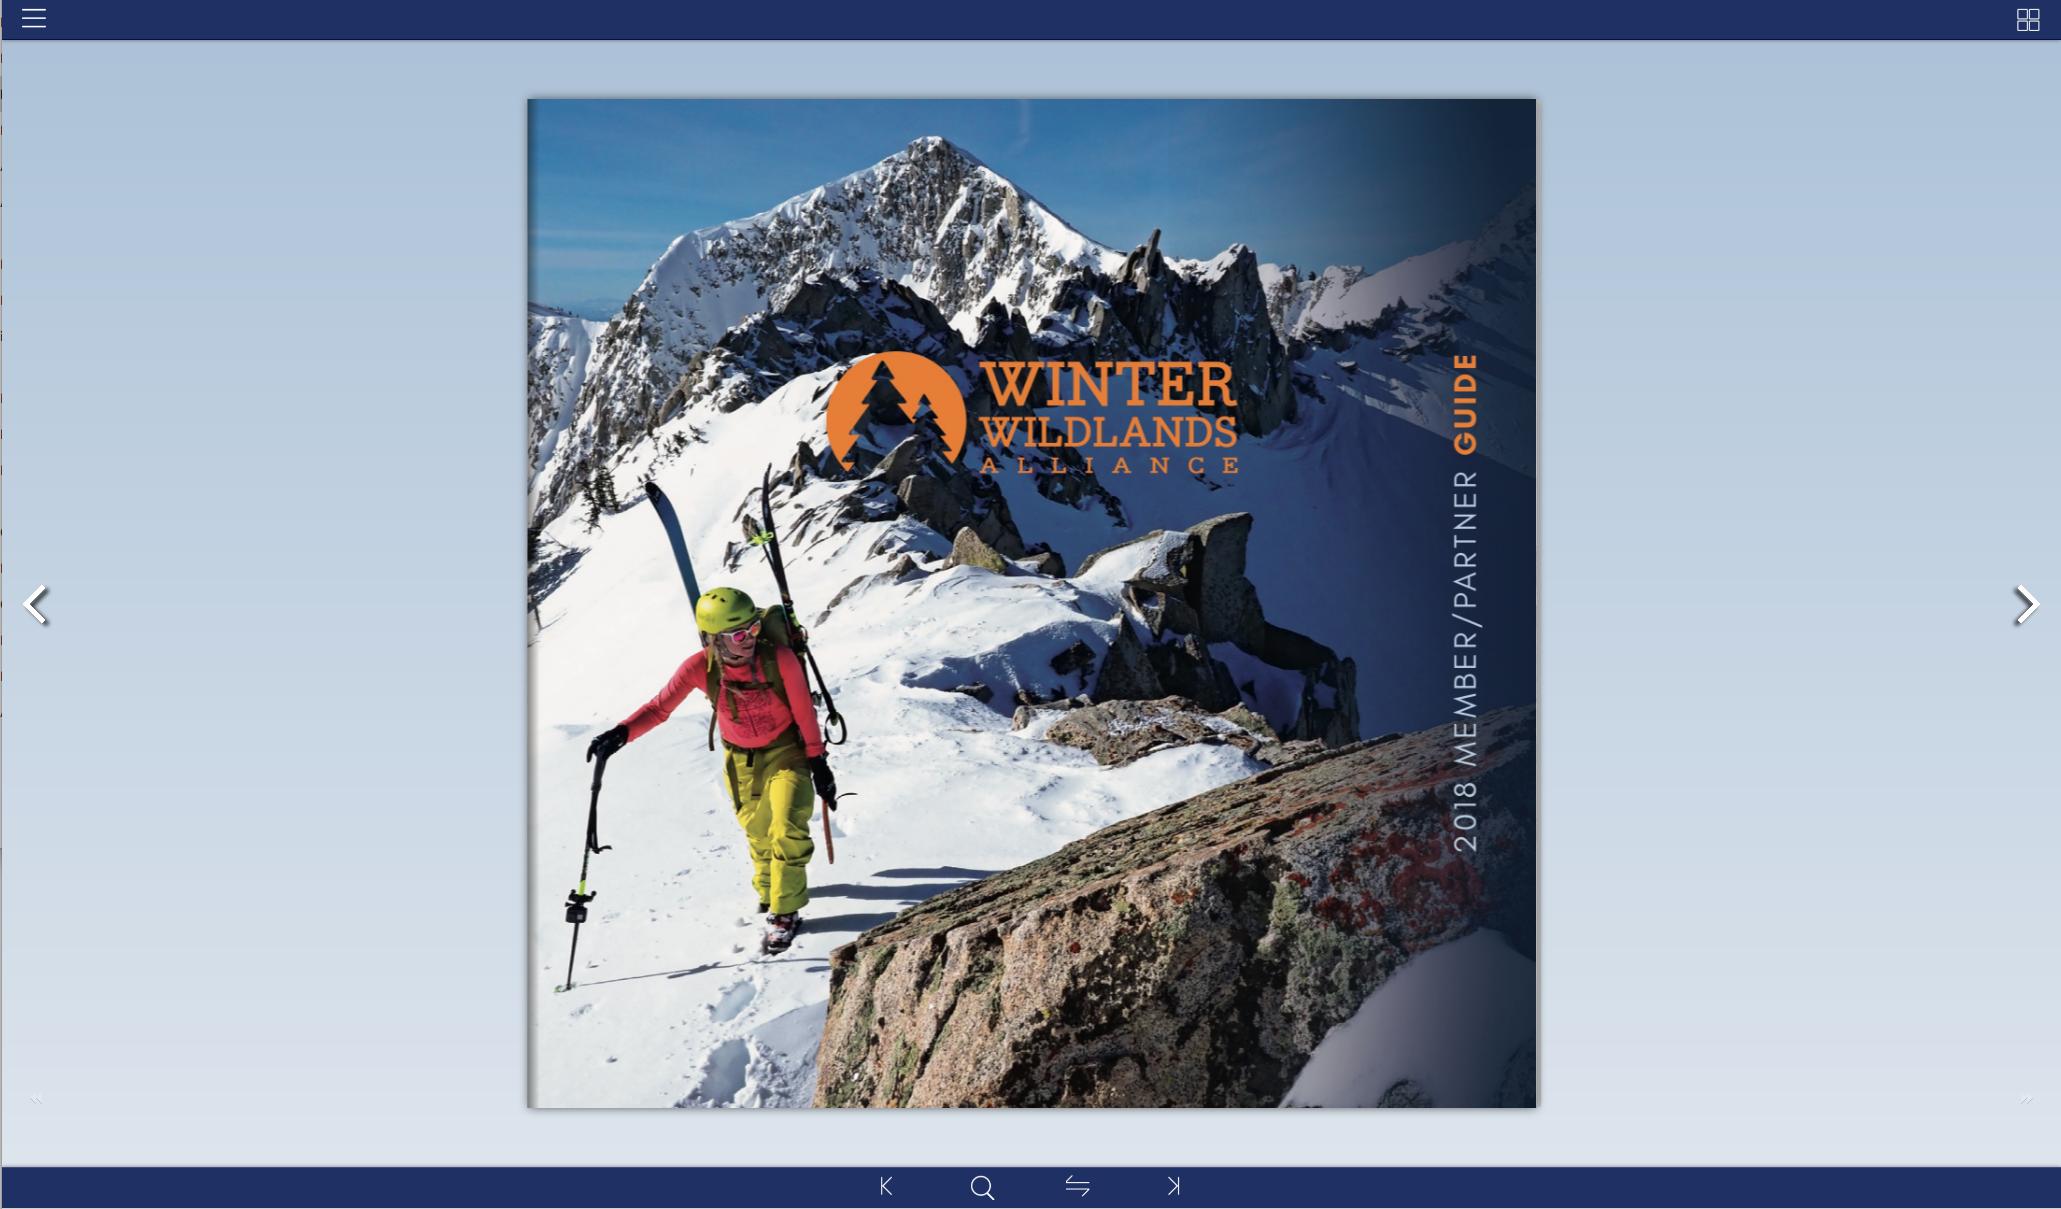 FlipBook Winter Wildlands Alliance